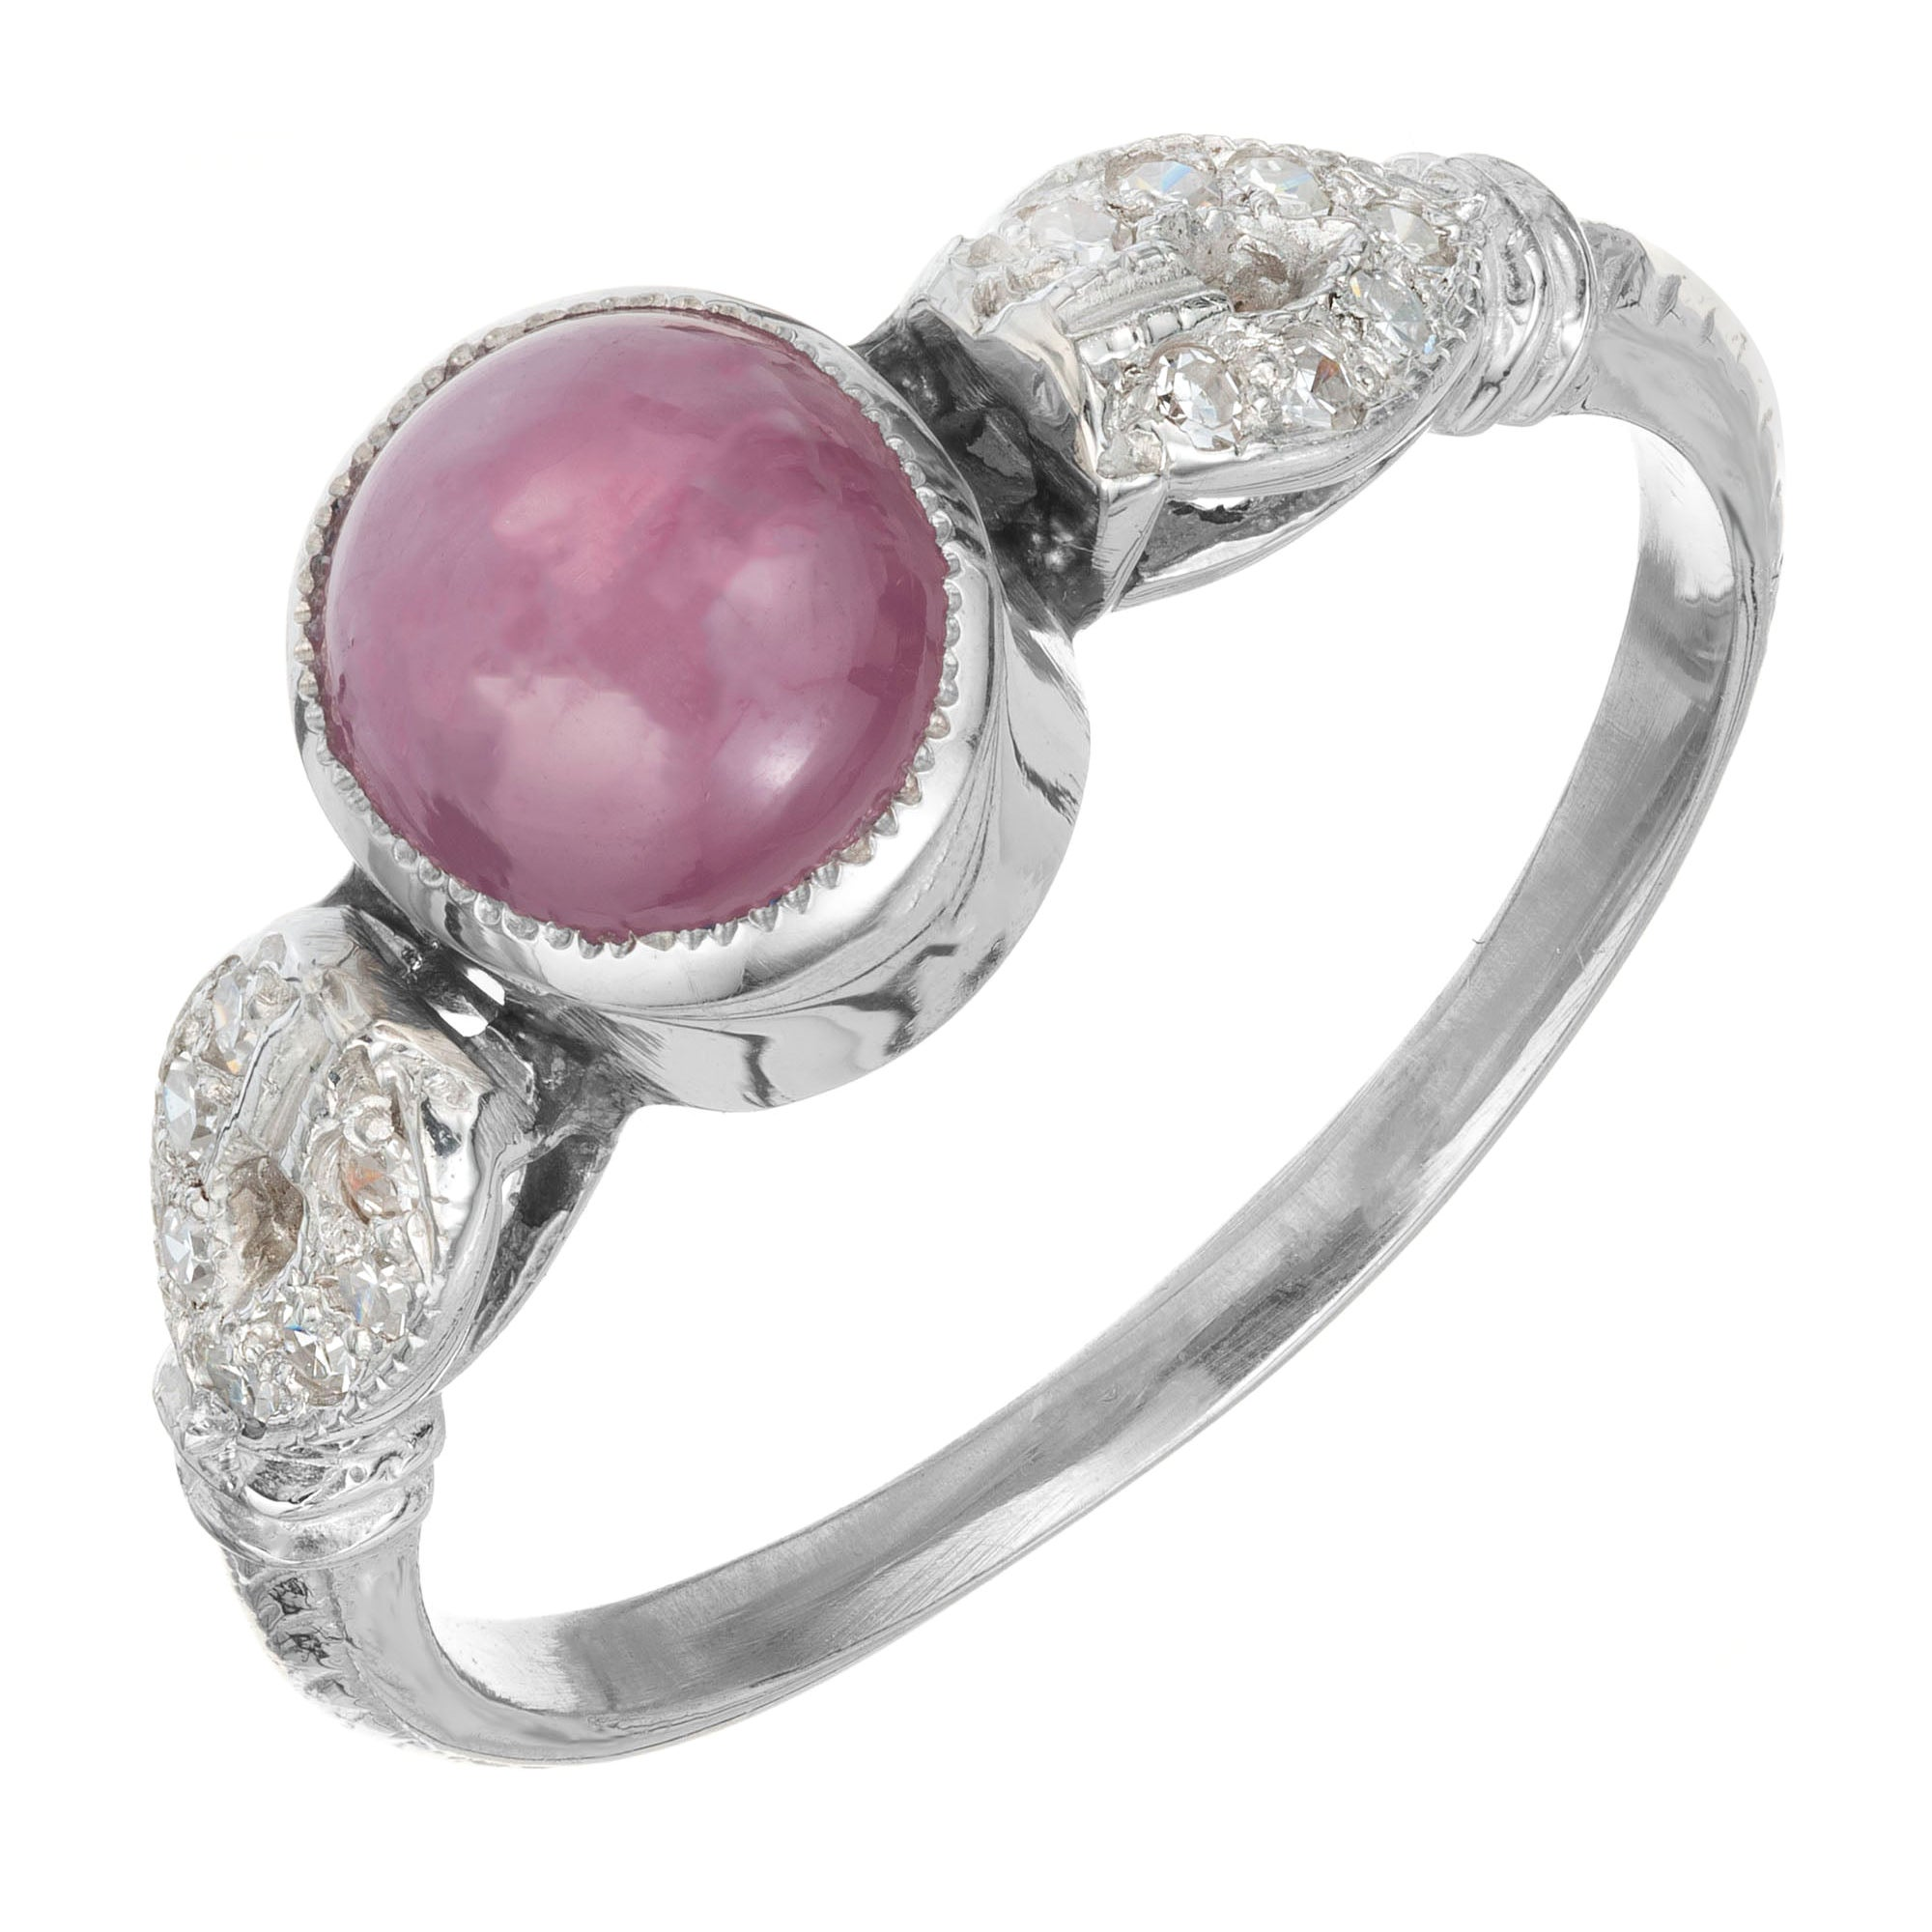 GIA Certified 2.61 Carat Star Ruby Diamond Platinum Art Deco Engagement Ring